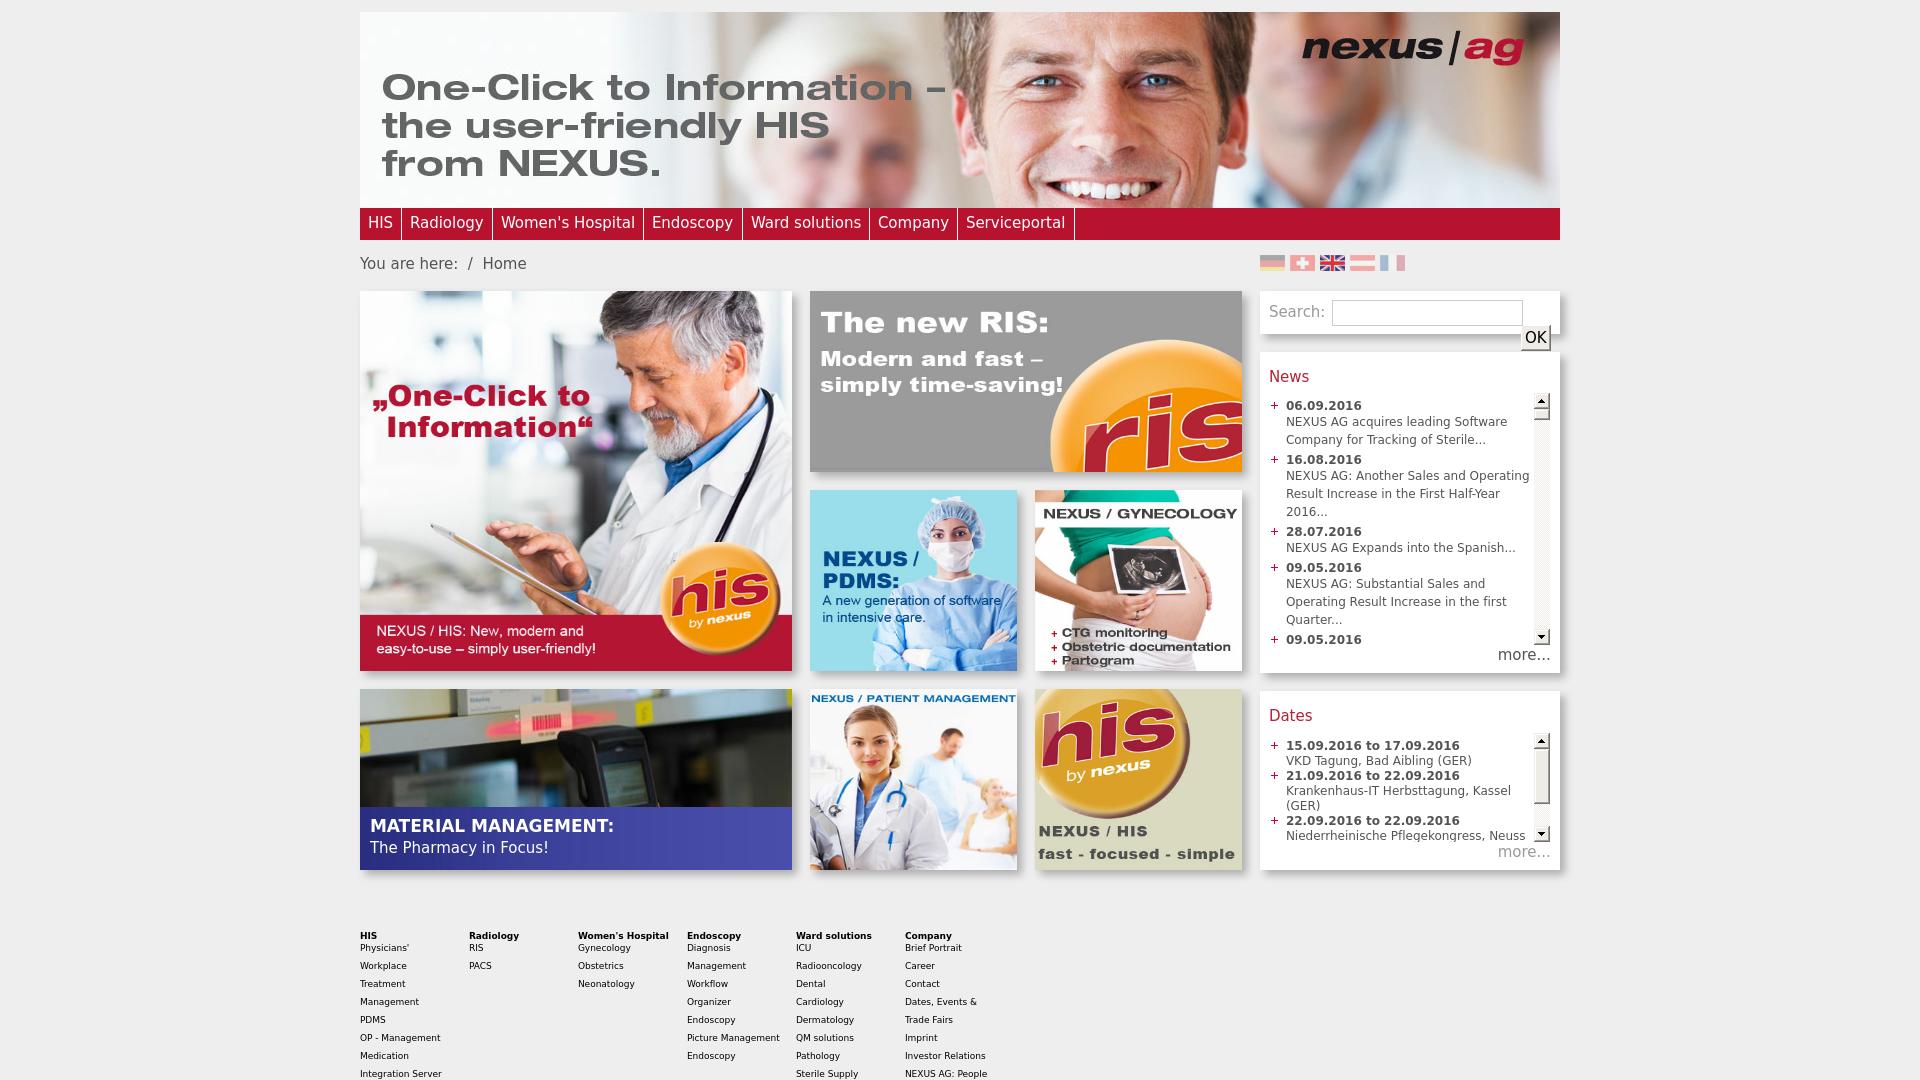 Schön Krankenhaus Management Jobs Bilder - Anatomie Ideen - finotti.info